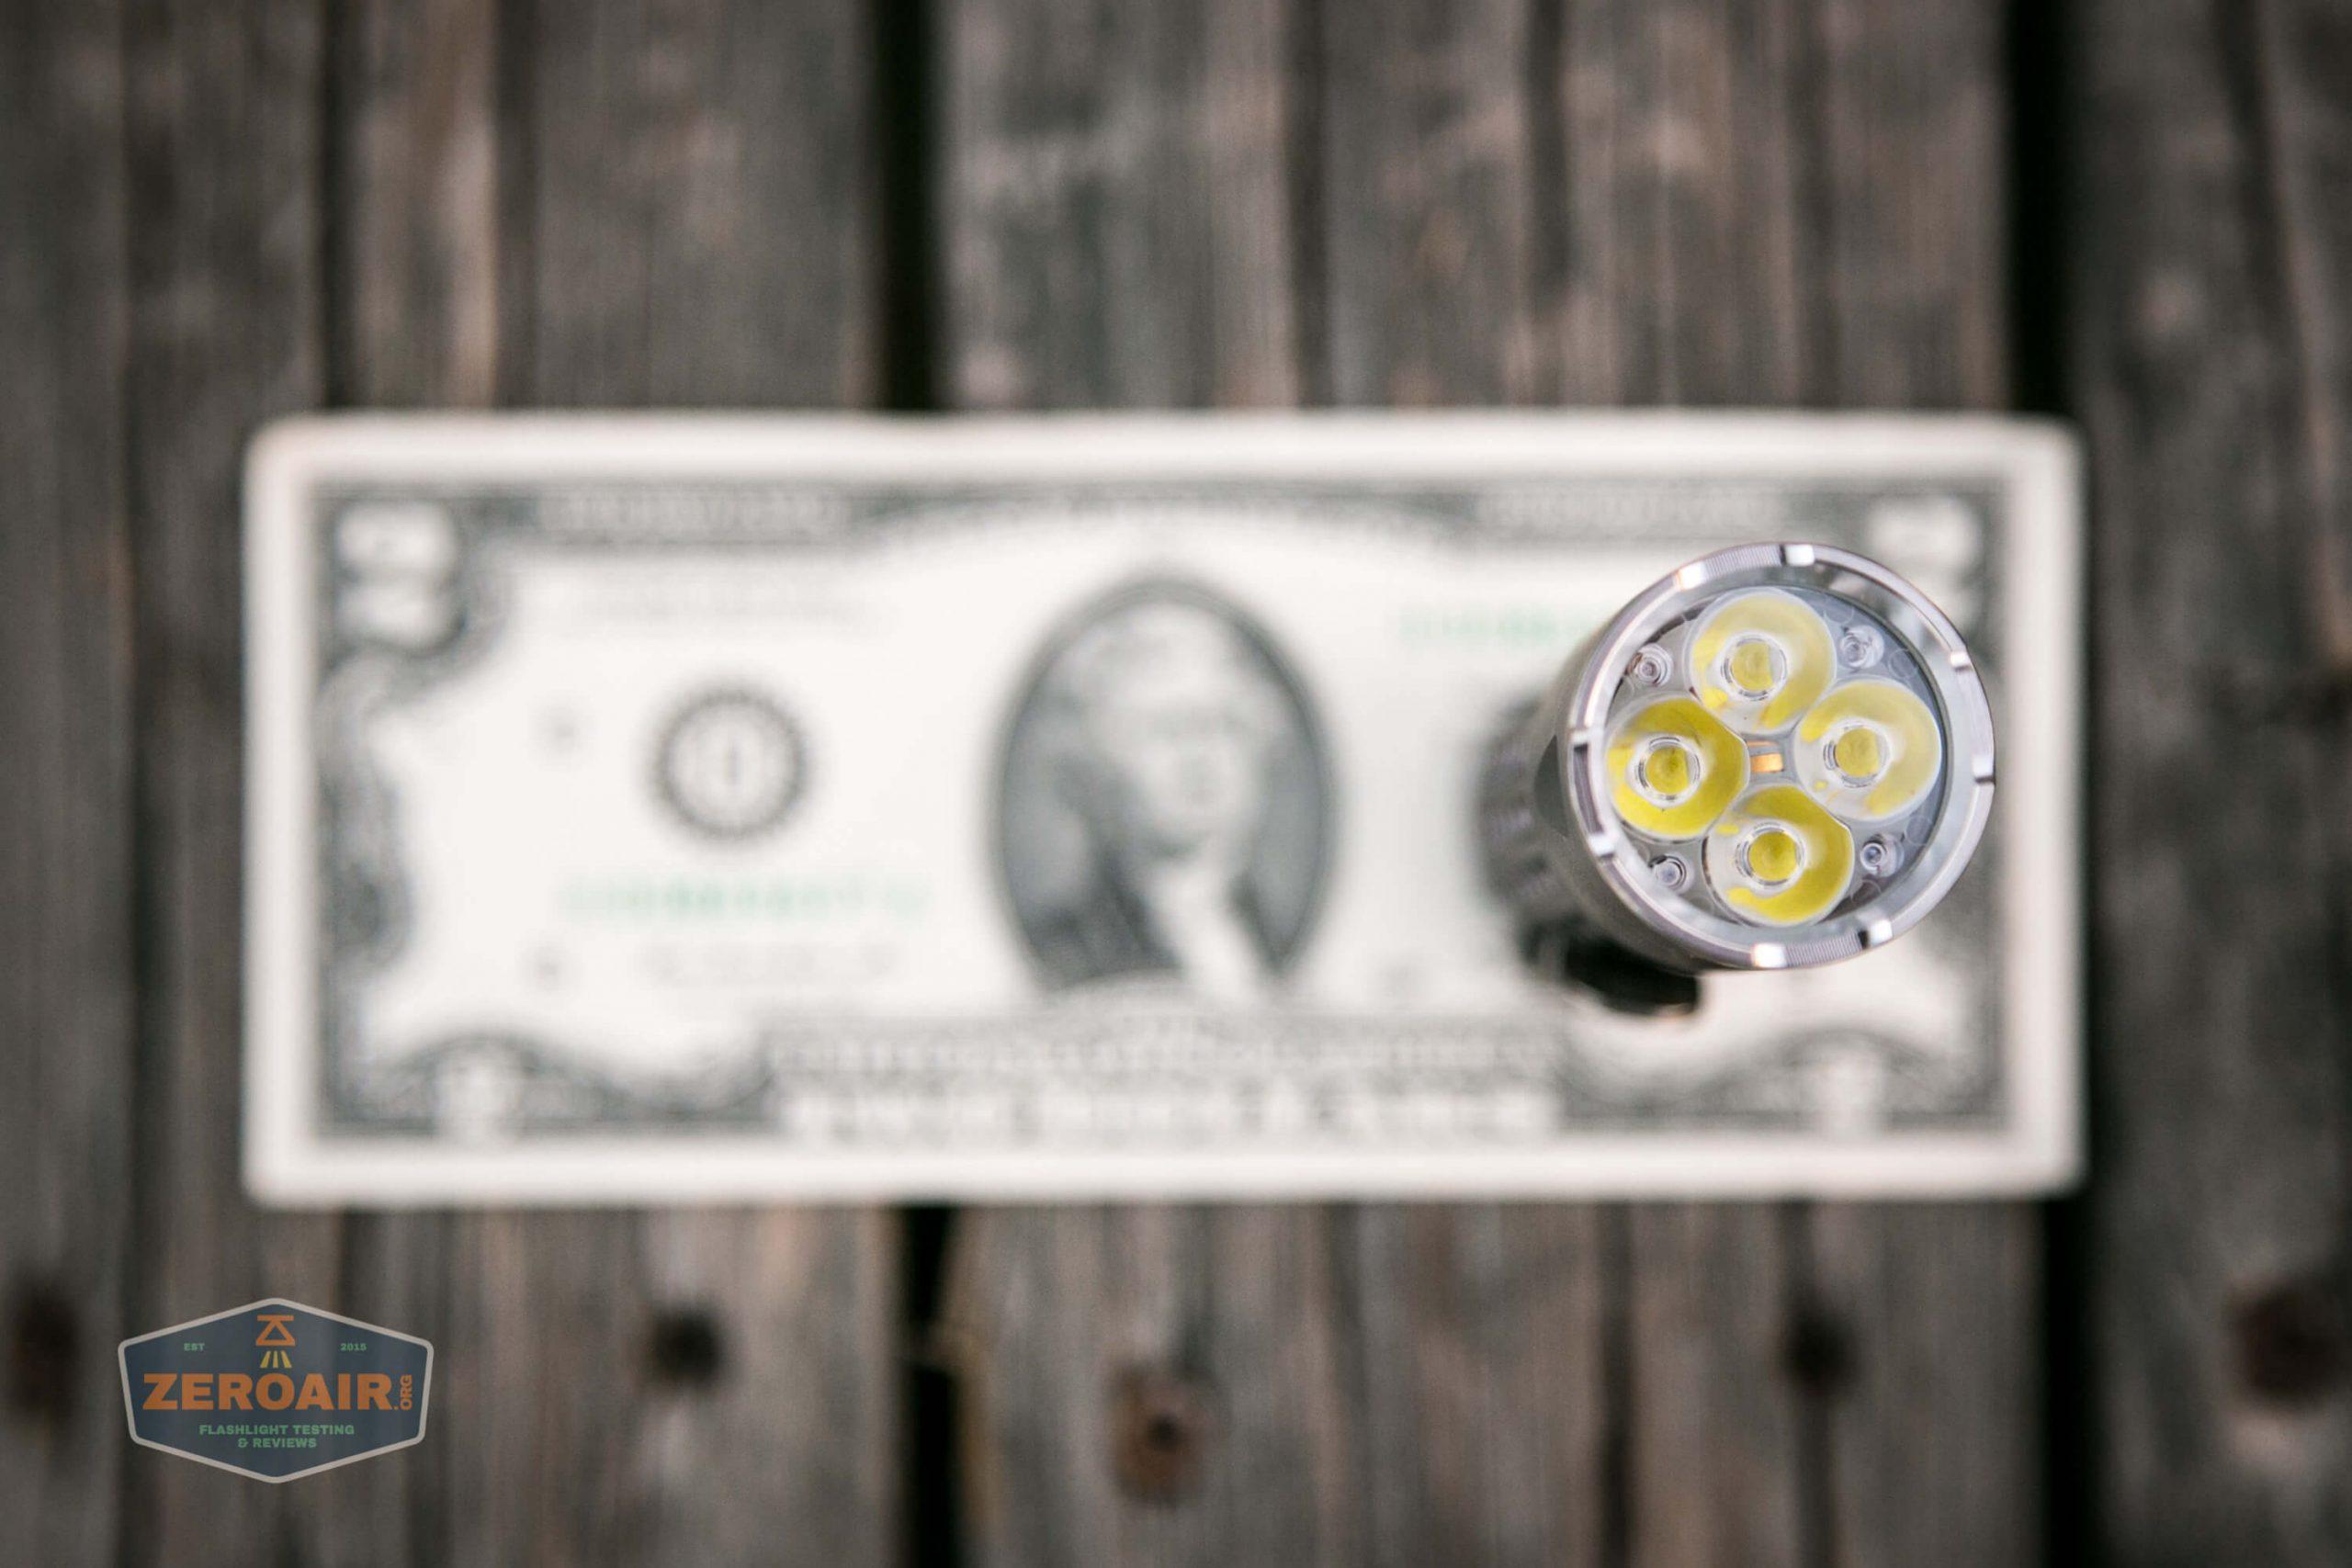 countycomm reylight 21700 quad emitter flashlight on two dollar bill